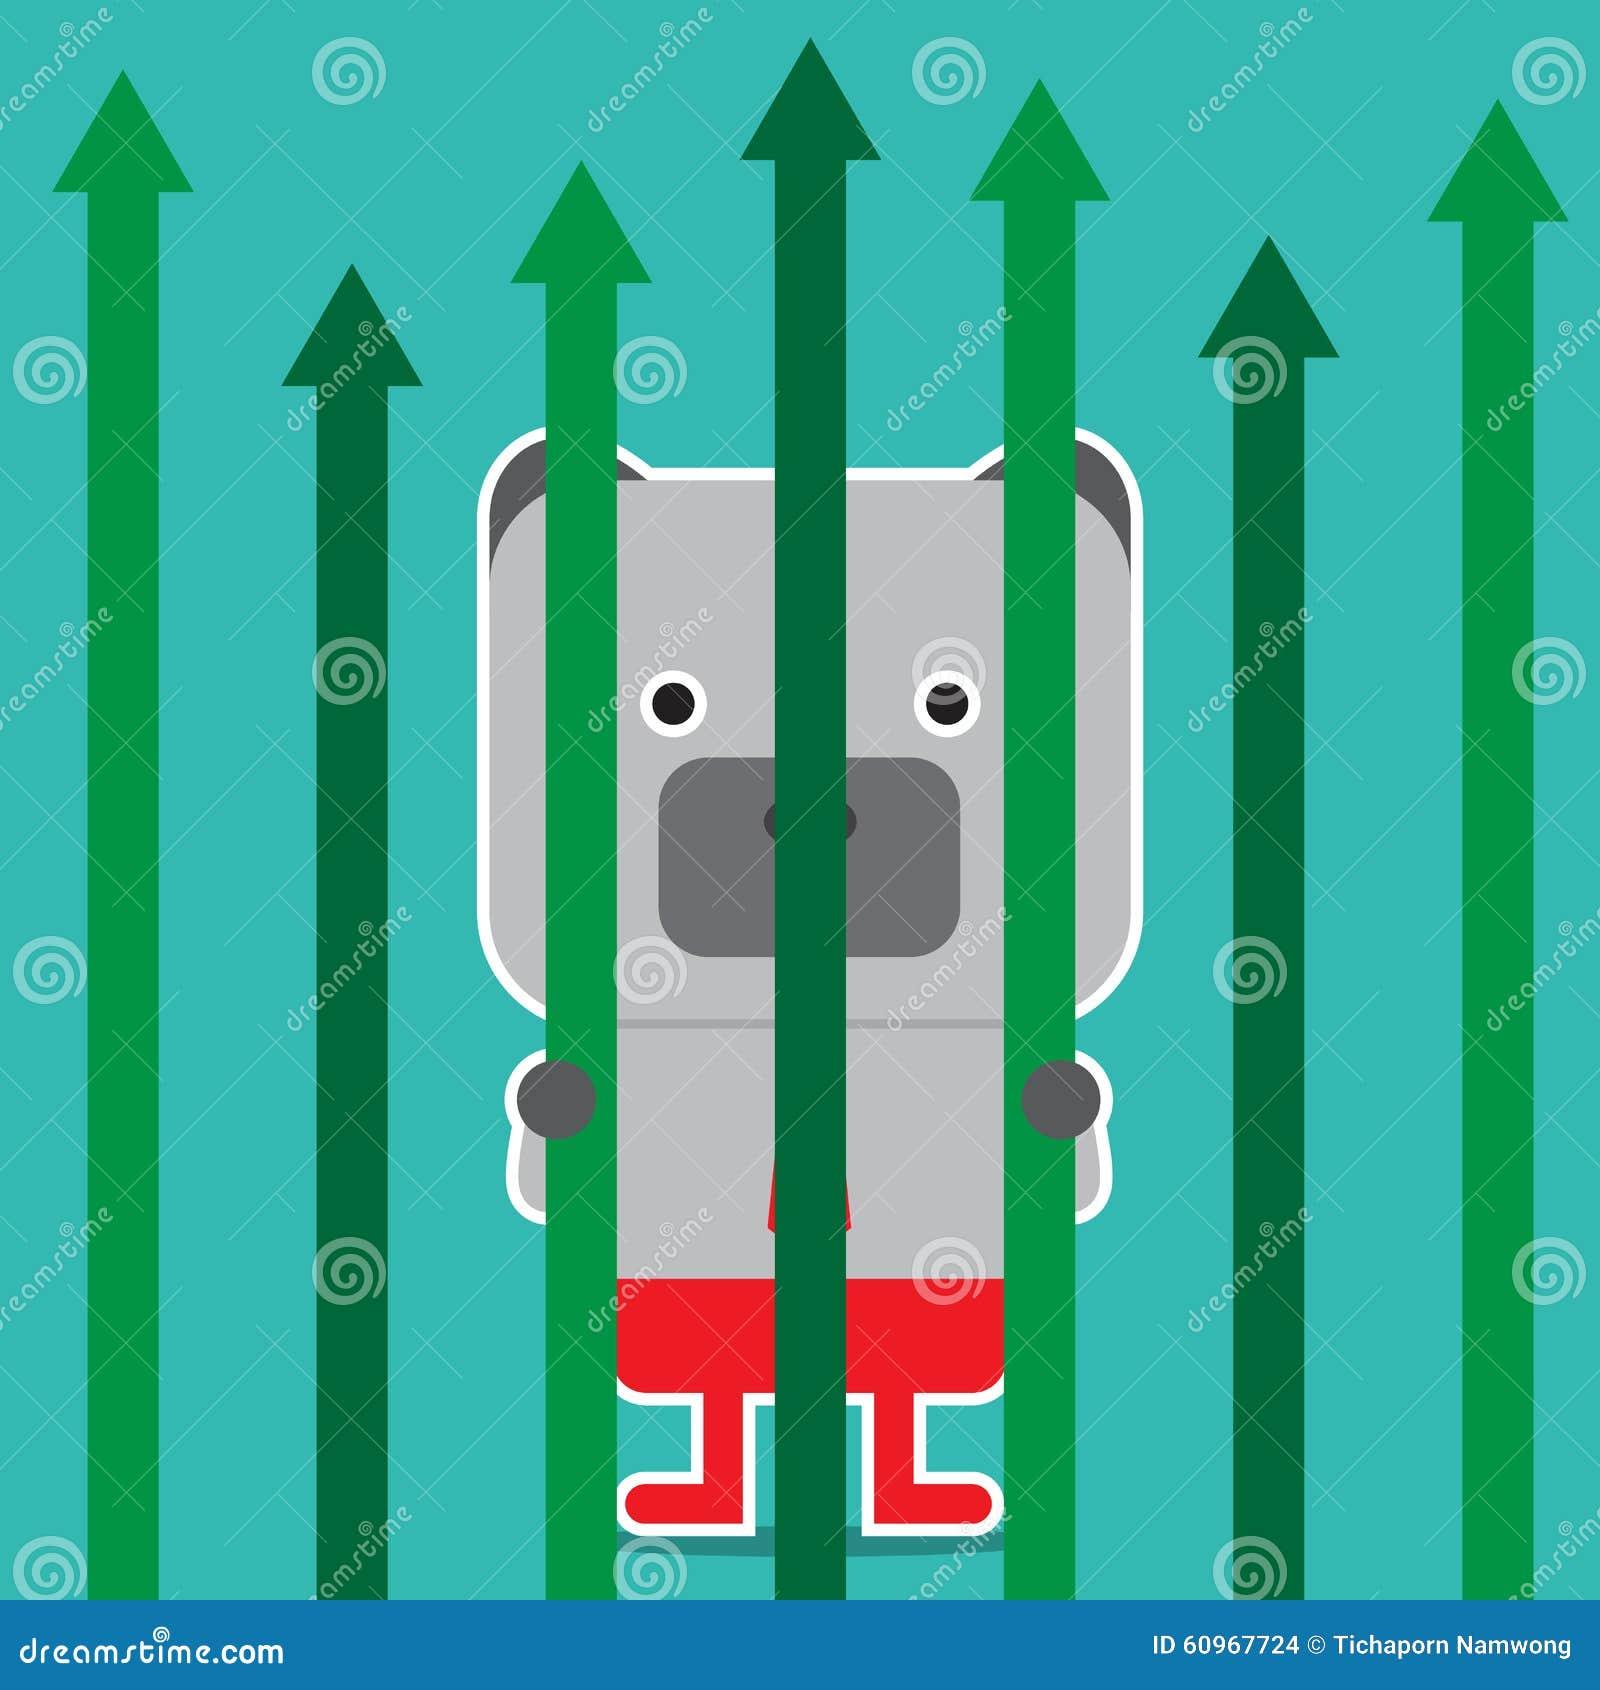 Illustration Of Bear Symbol Of Stock Market Trend Stock